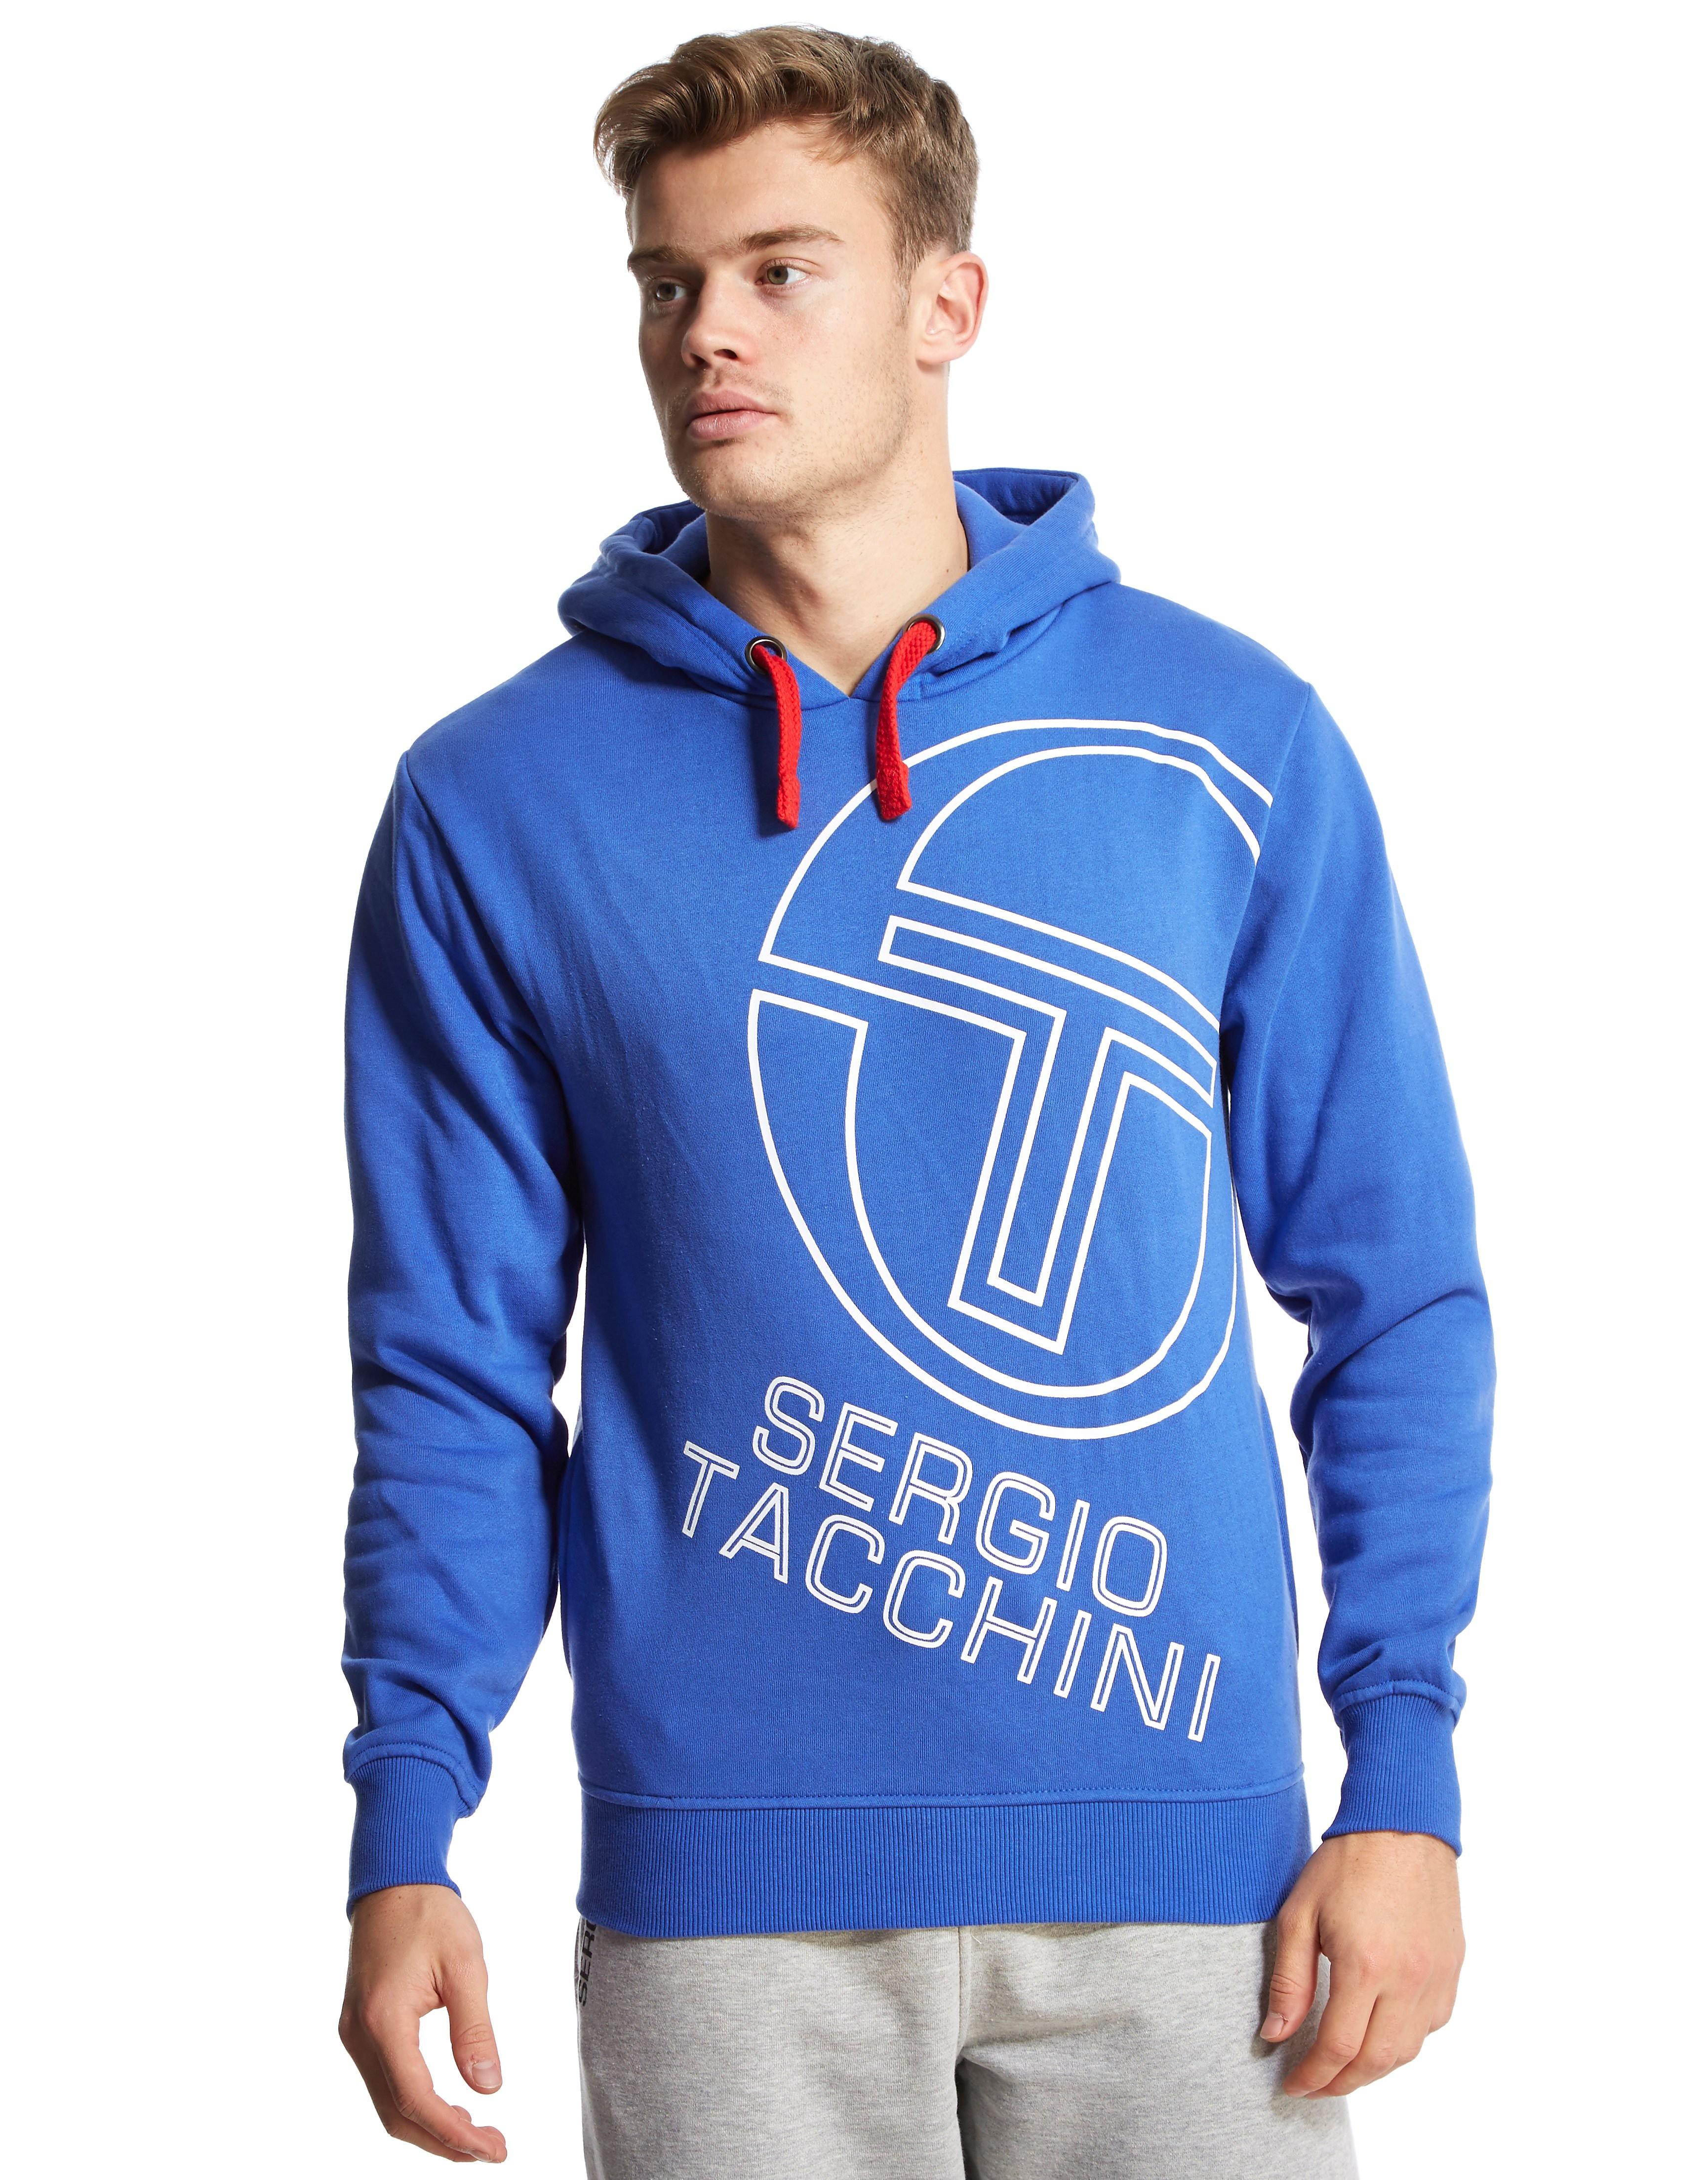 Sergio Tacchini Stackhouse Hoody